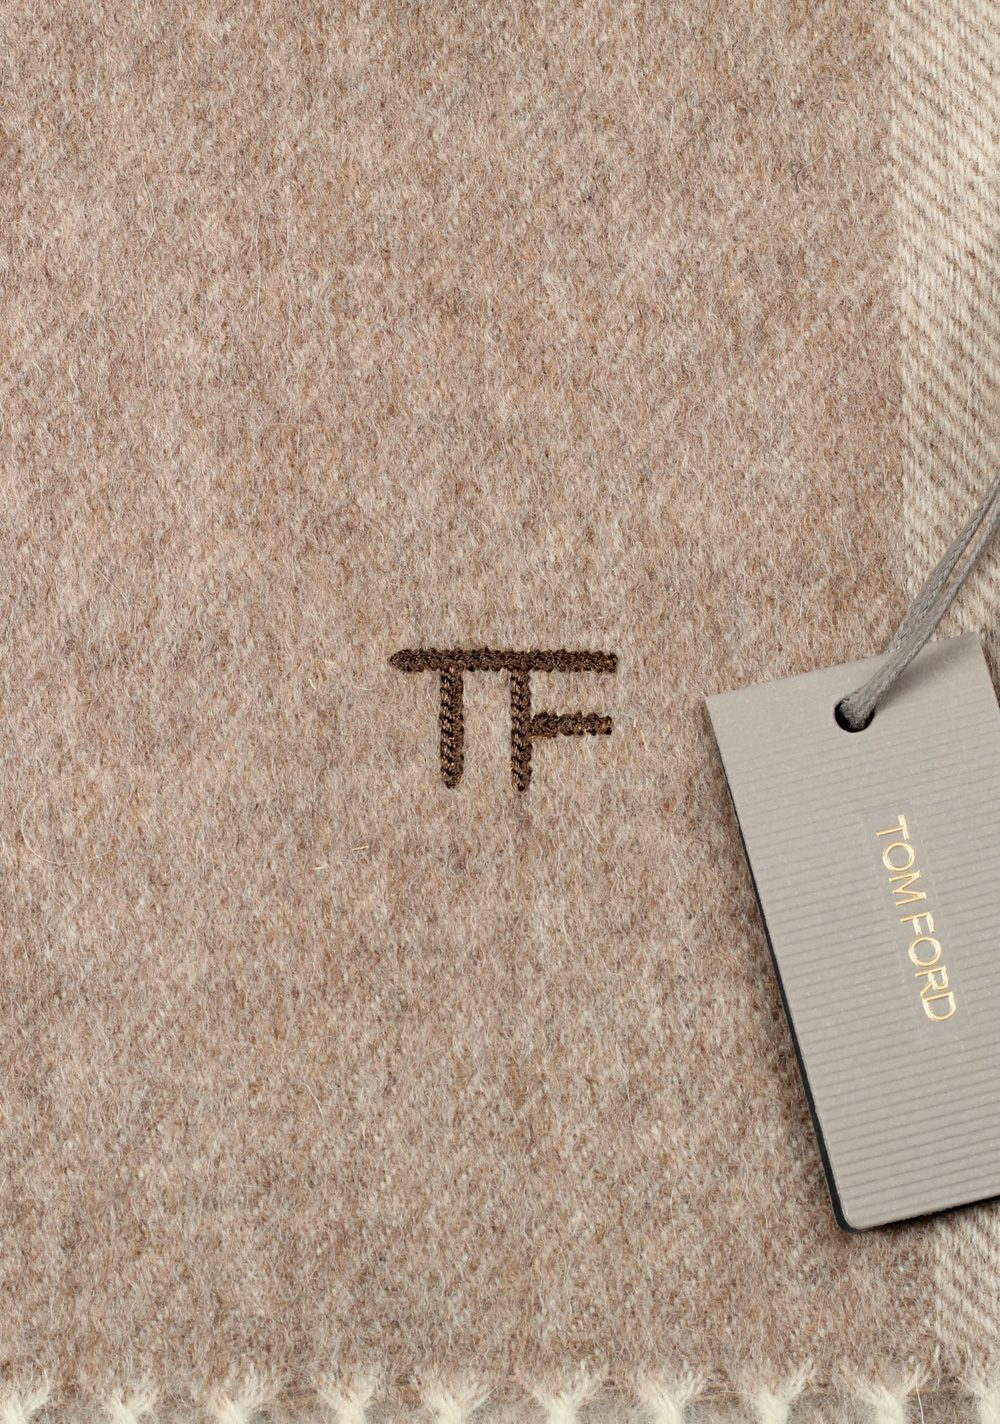 Tom Ford Camel Wool Alpaca Cashmere Signature Scarf 82″ / 11″ | Costume Limité